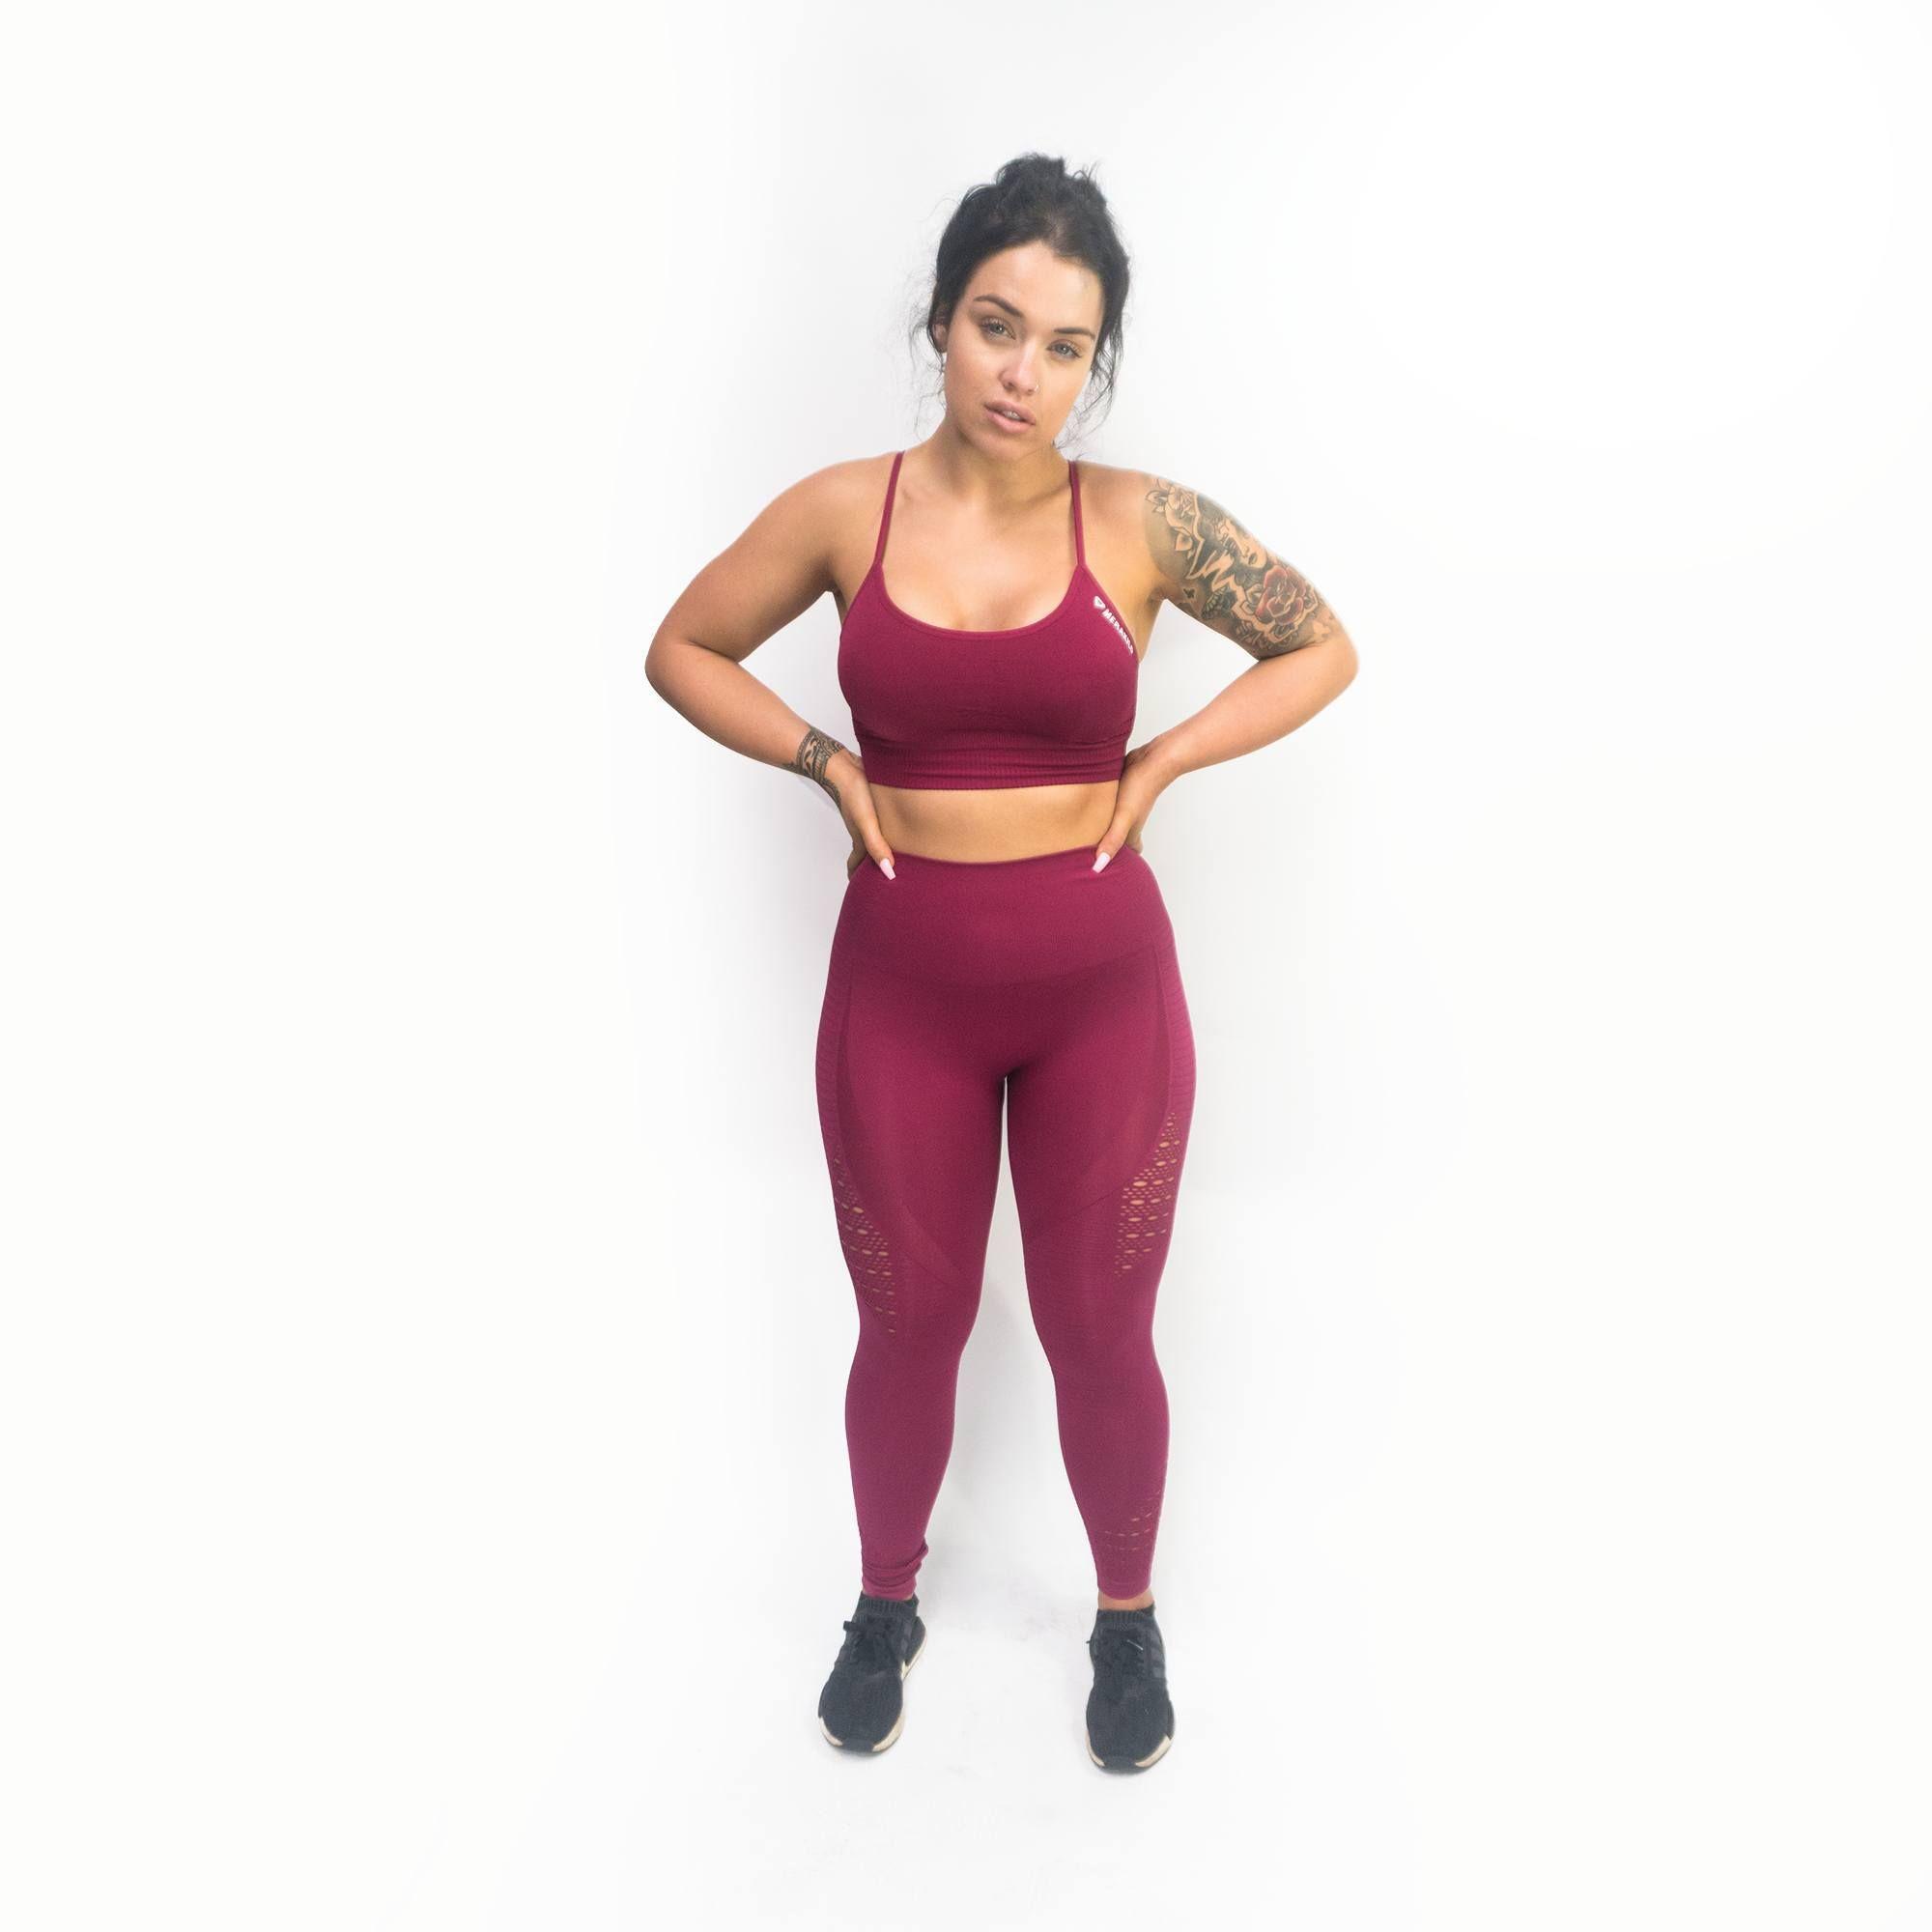 440006d5f0335 Adapt Seamless Sports Bra - Red in 2019 | Fitness | Bra, Red, Pants